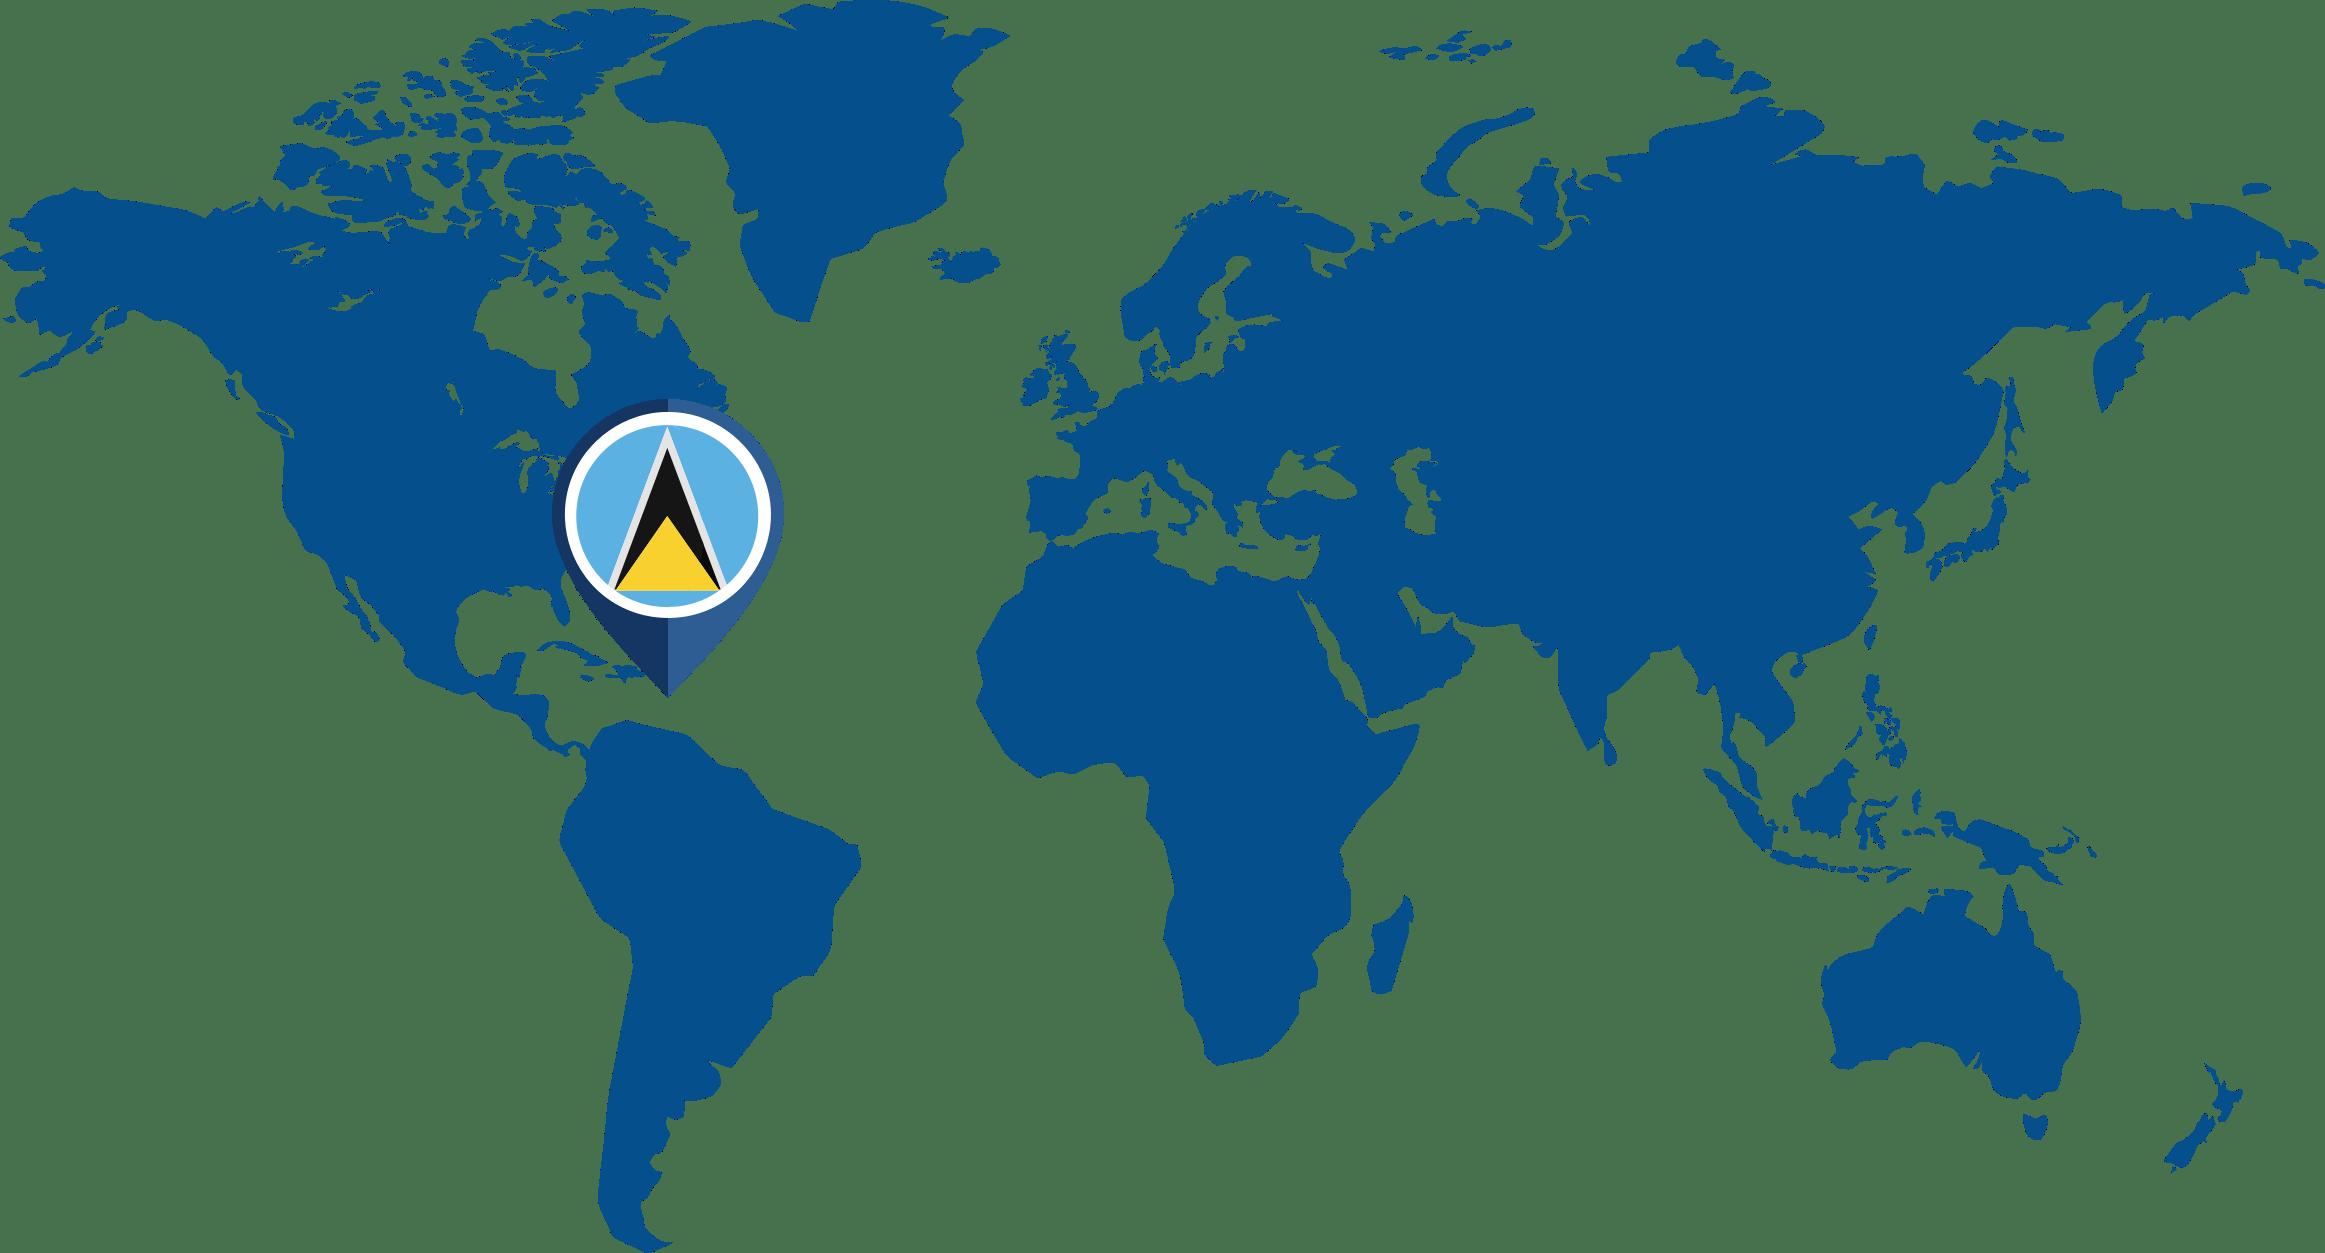 https://www.bluemina.com/wp-content/uploads/2020/02/Saint-Lucia-Location.png